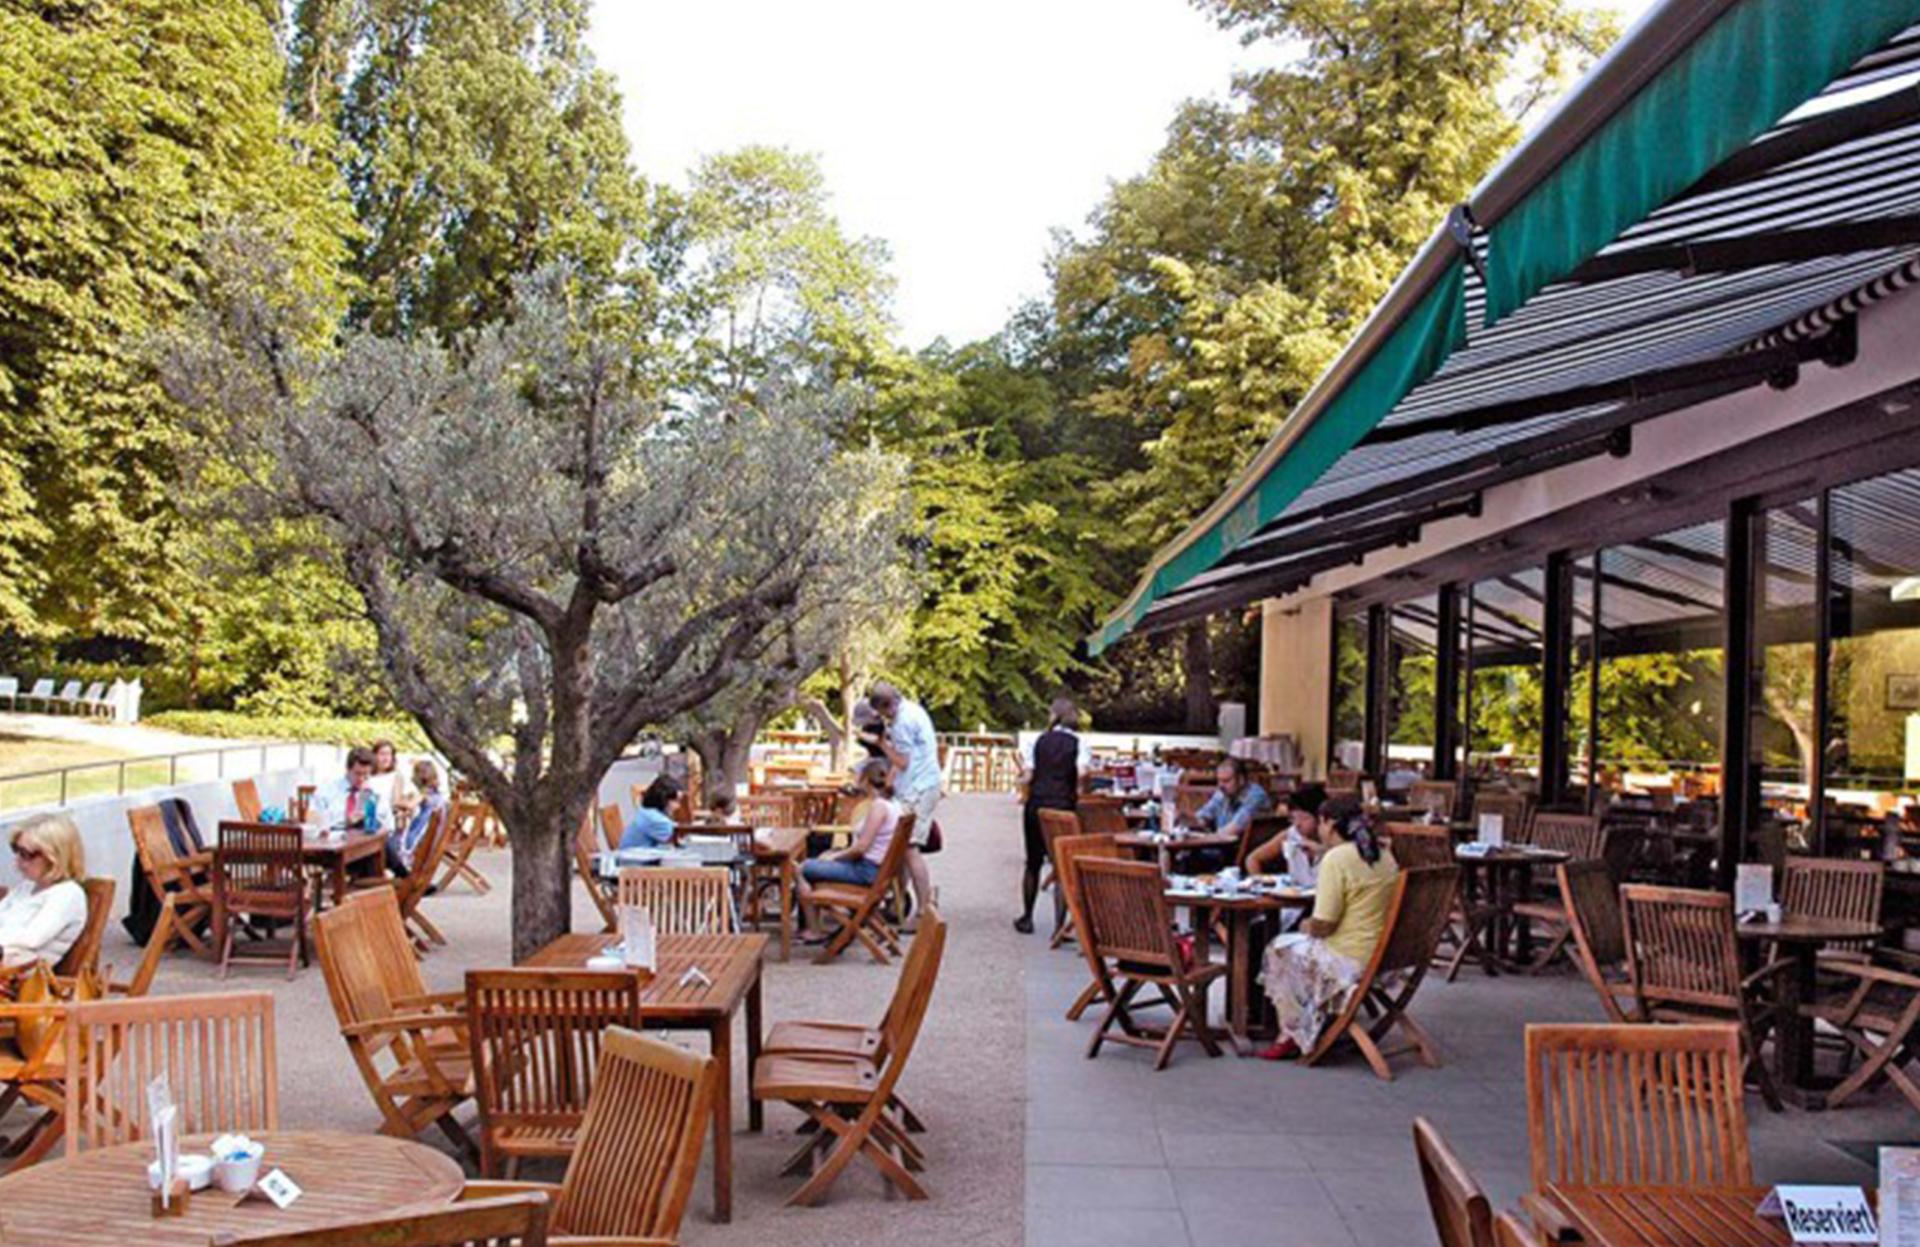 Cafehaus Siesmayer frankfurt parking